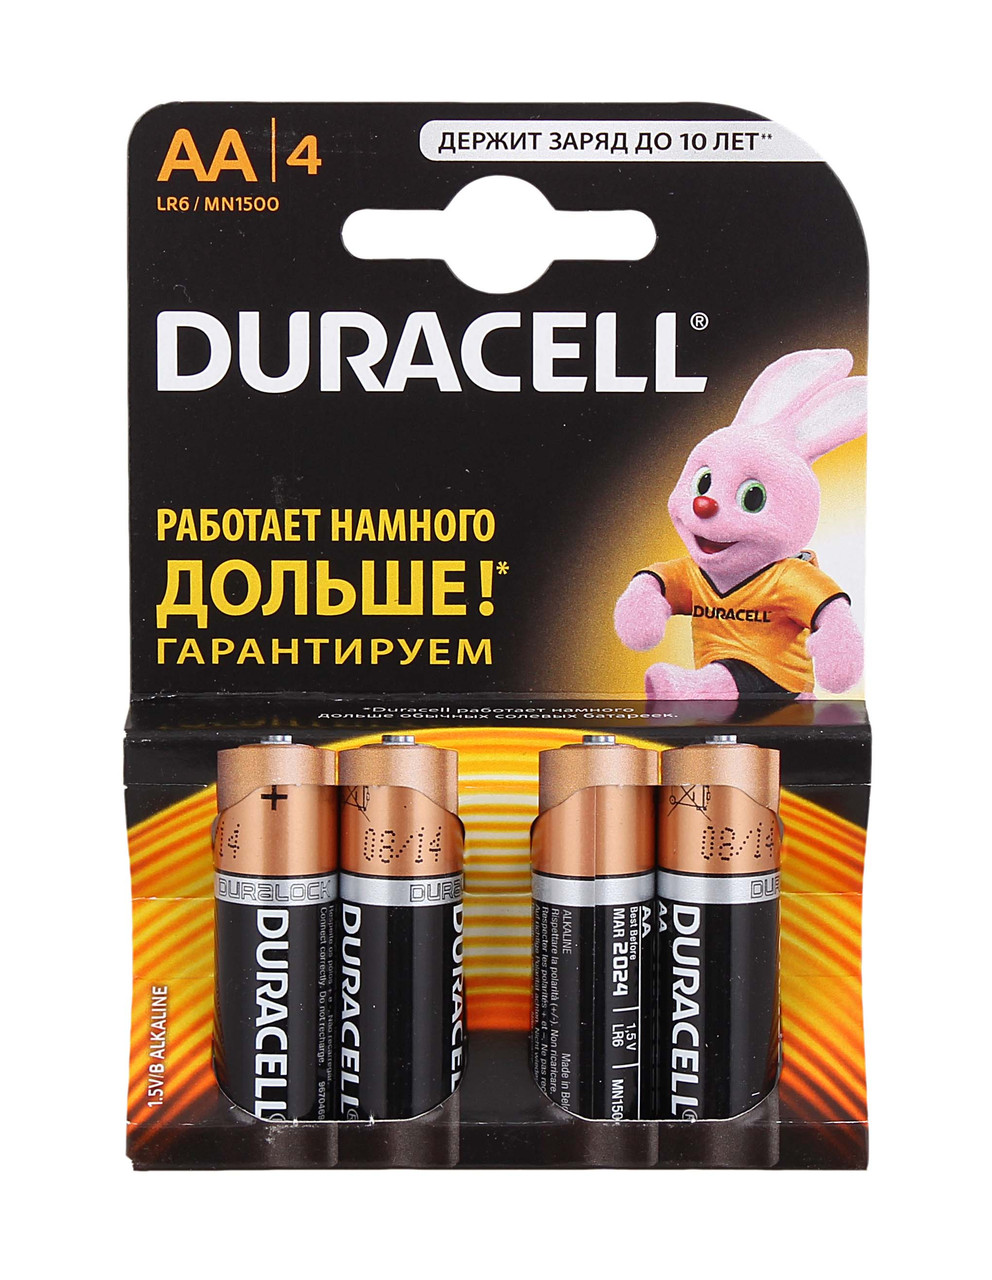 Батарейки Дюрасэл - Duracell АА NH Basic 4шт.